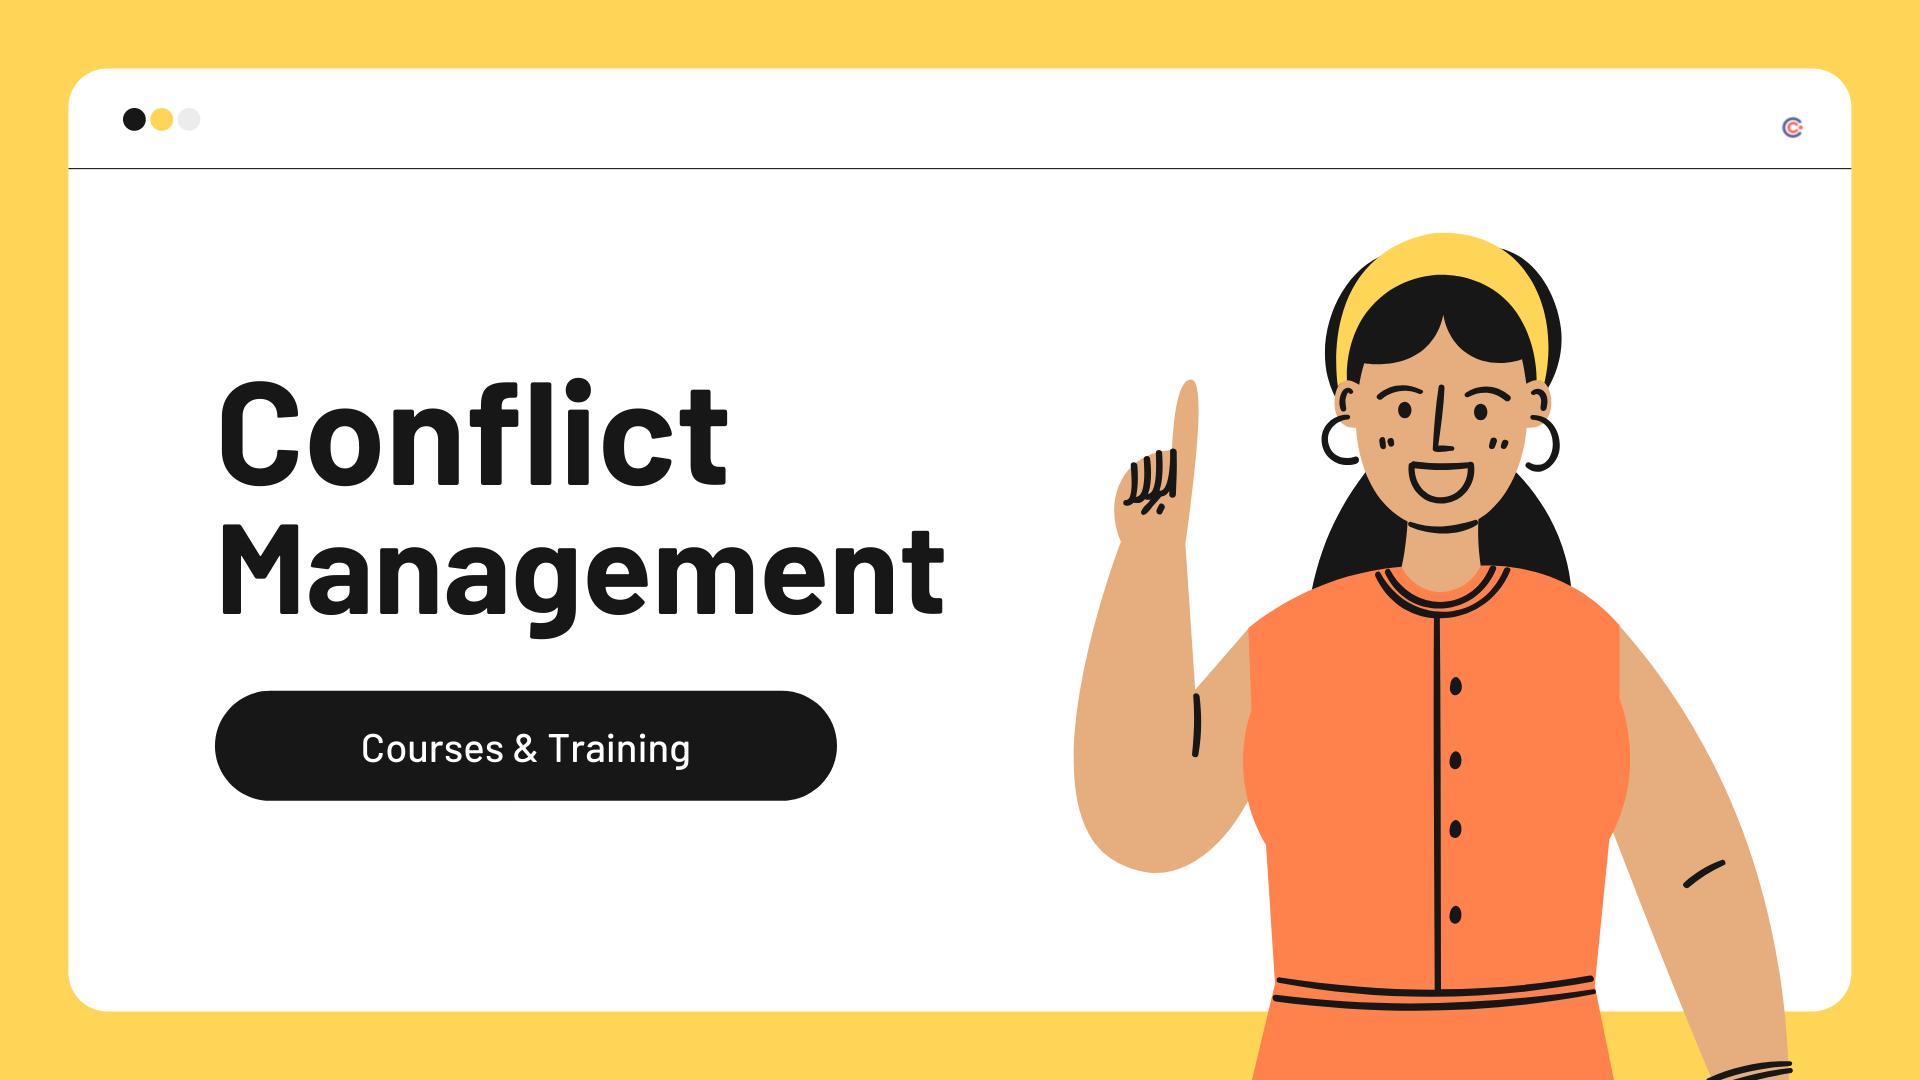 8 Best Conflict Management Courses & Training - Learn Conflict Management Online